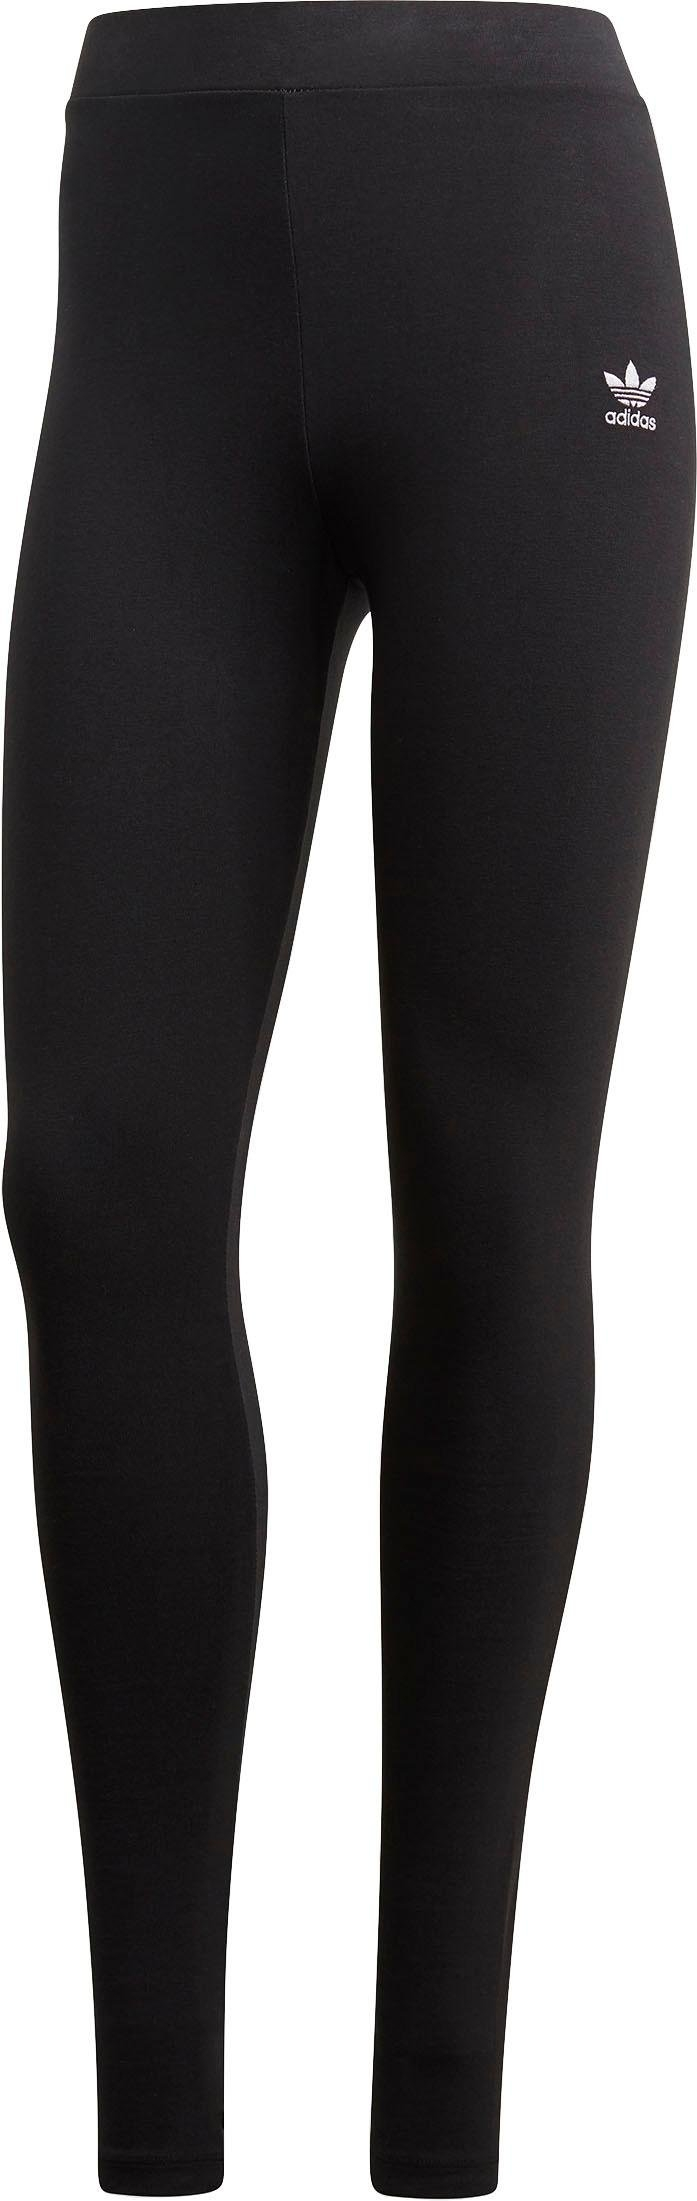 adidas Originals legging »TIGHT« nu online kopen bij OTTO